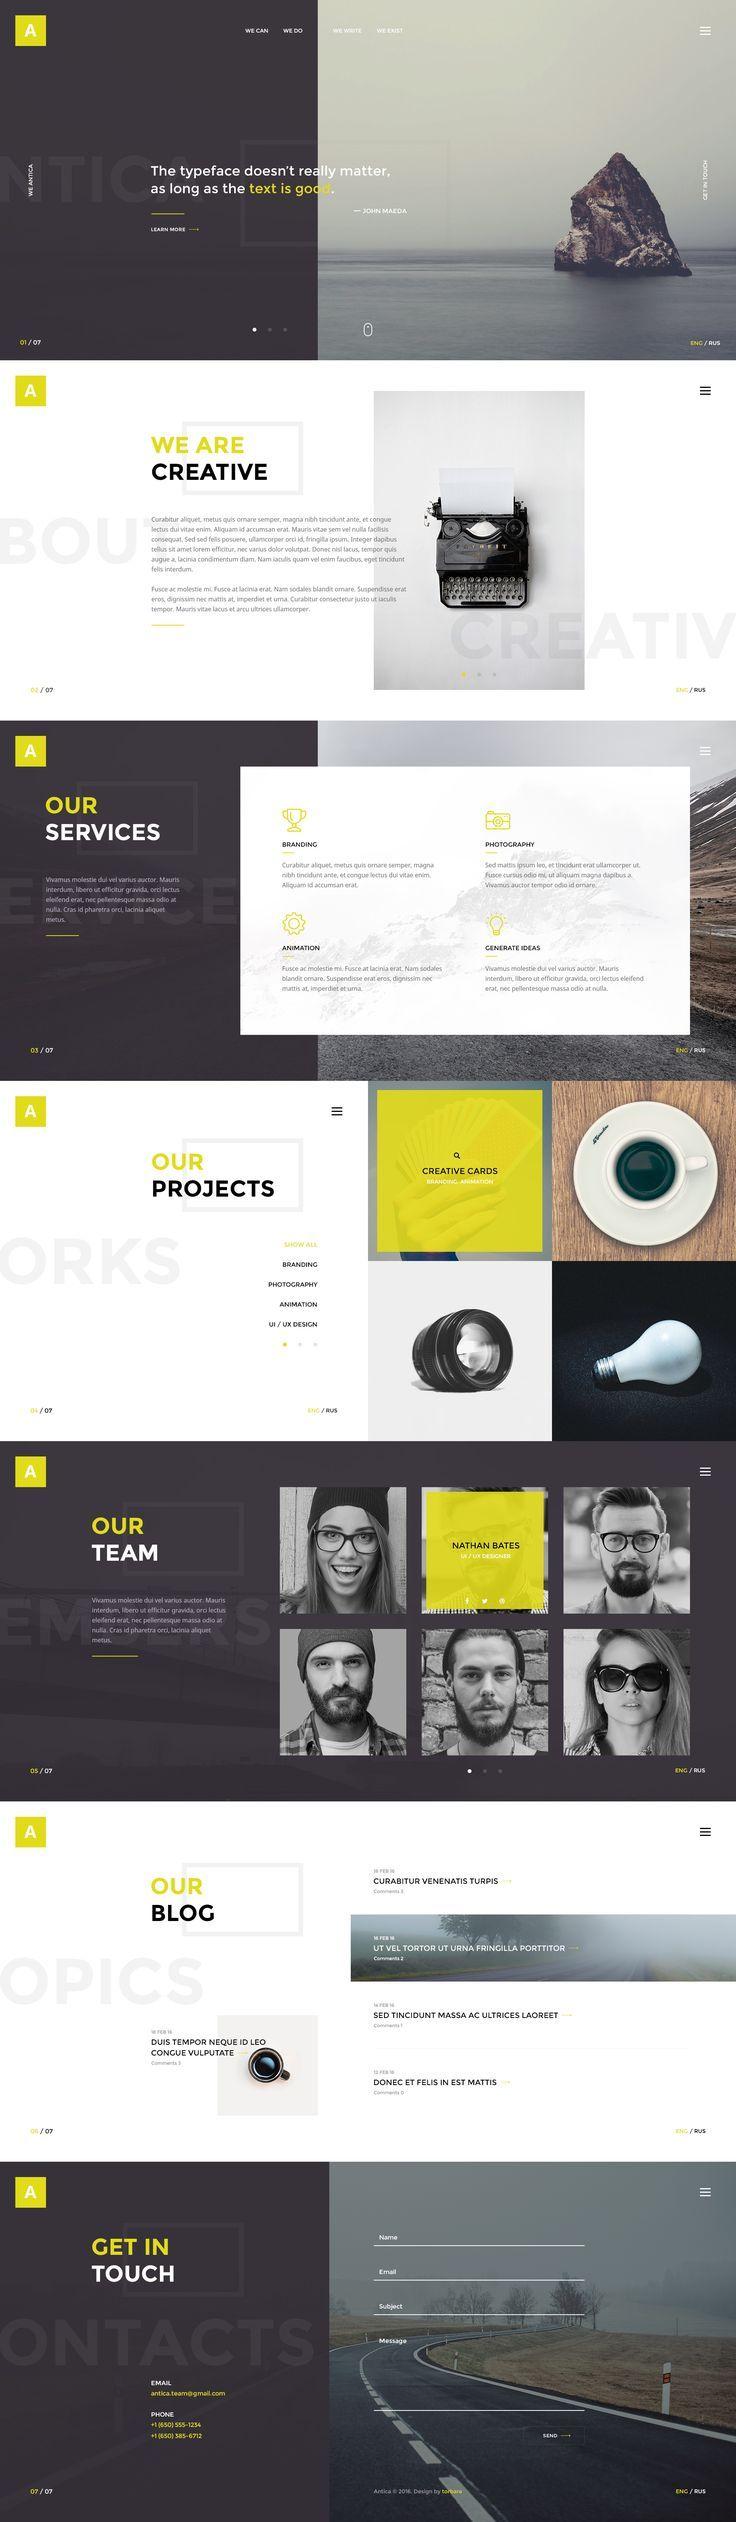 antica multipurpose business agencypersonal portfolio design agency websitepersonal website designsimple - Simple Website Design Ideas